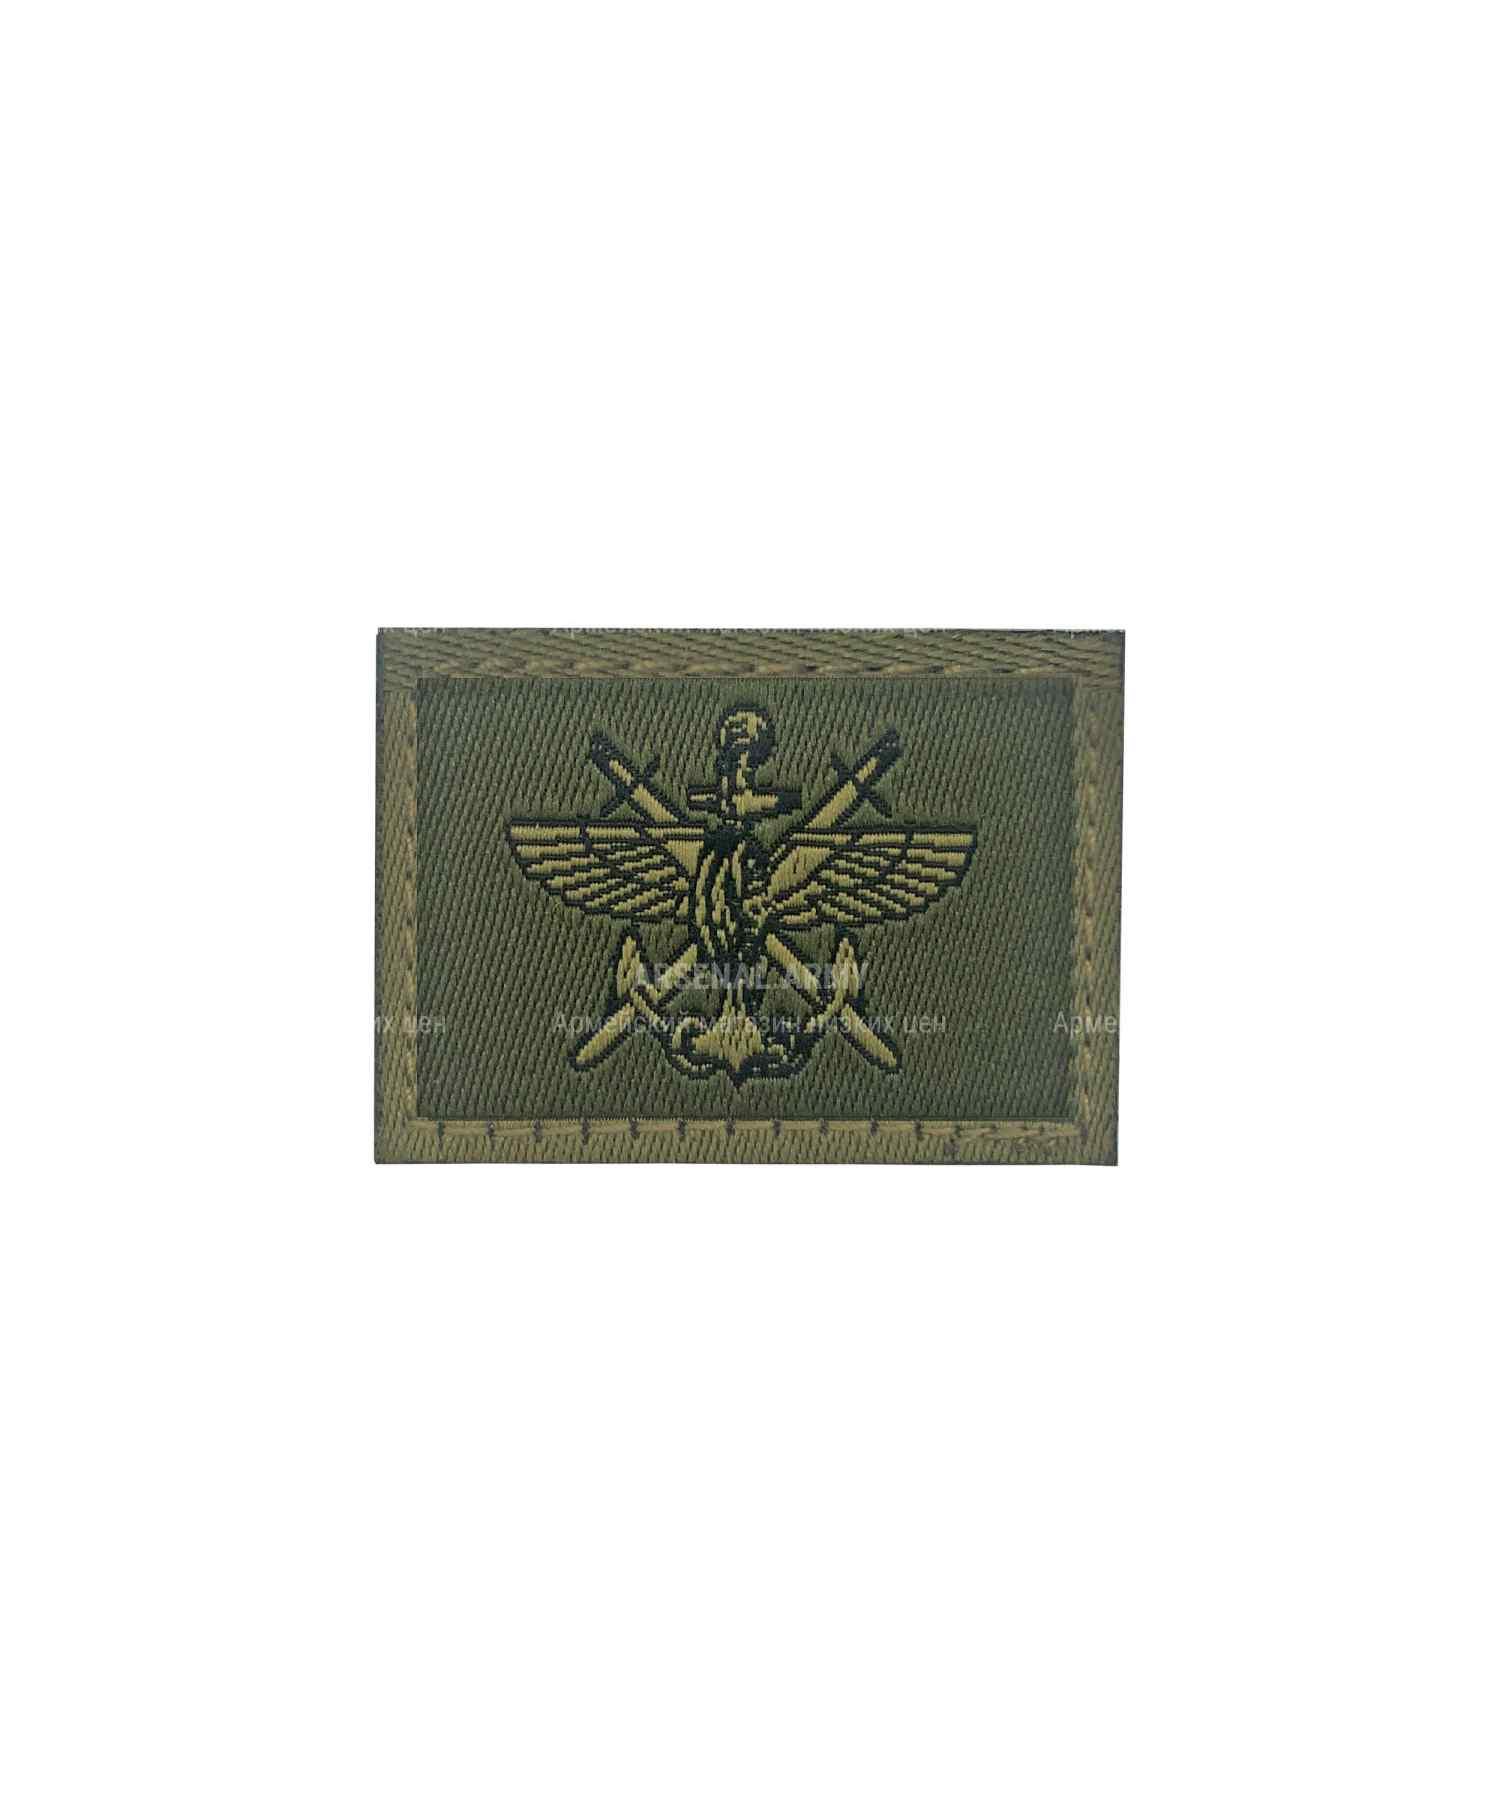 Эмблема ВОСО на липе зеленая